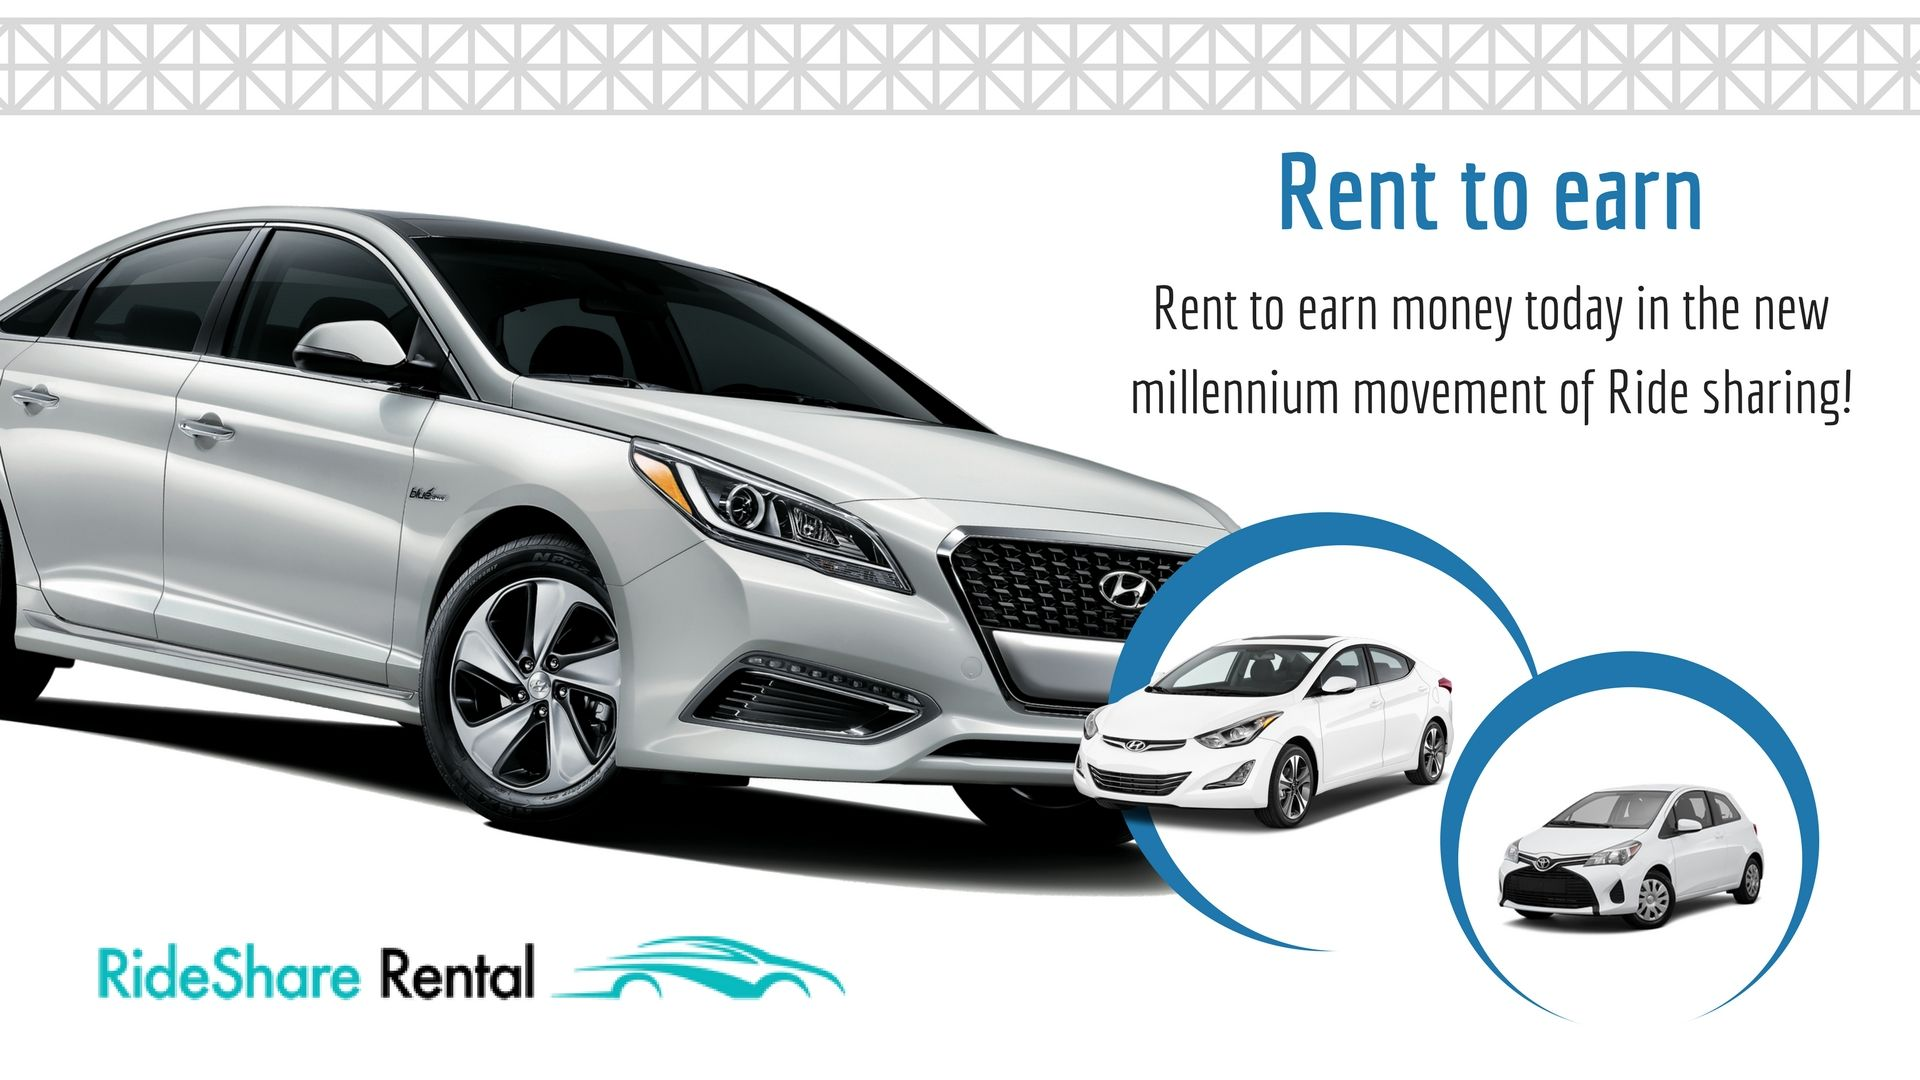 Transportation Company Offering Rental Car to Earn Money